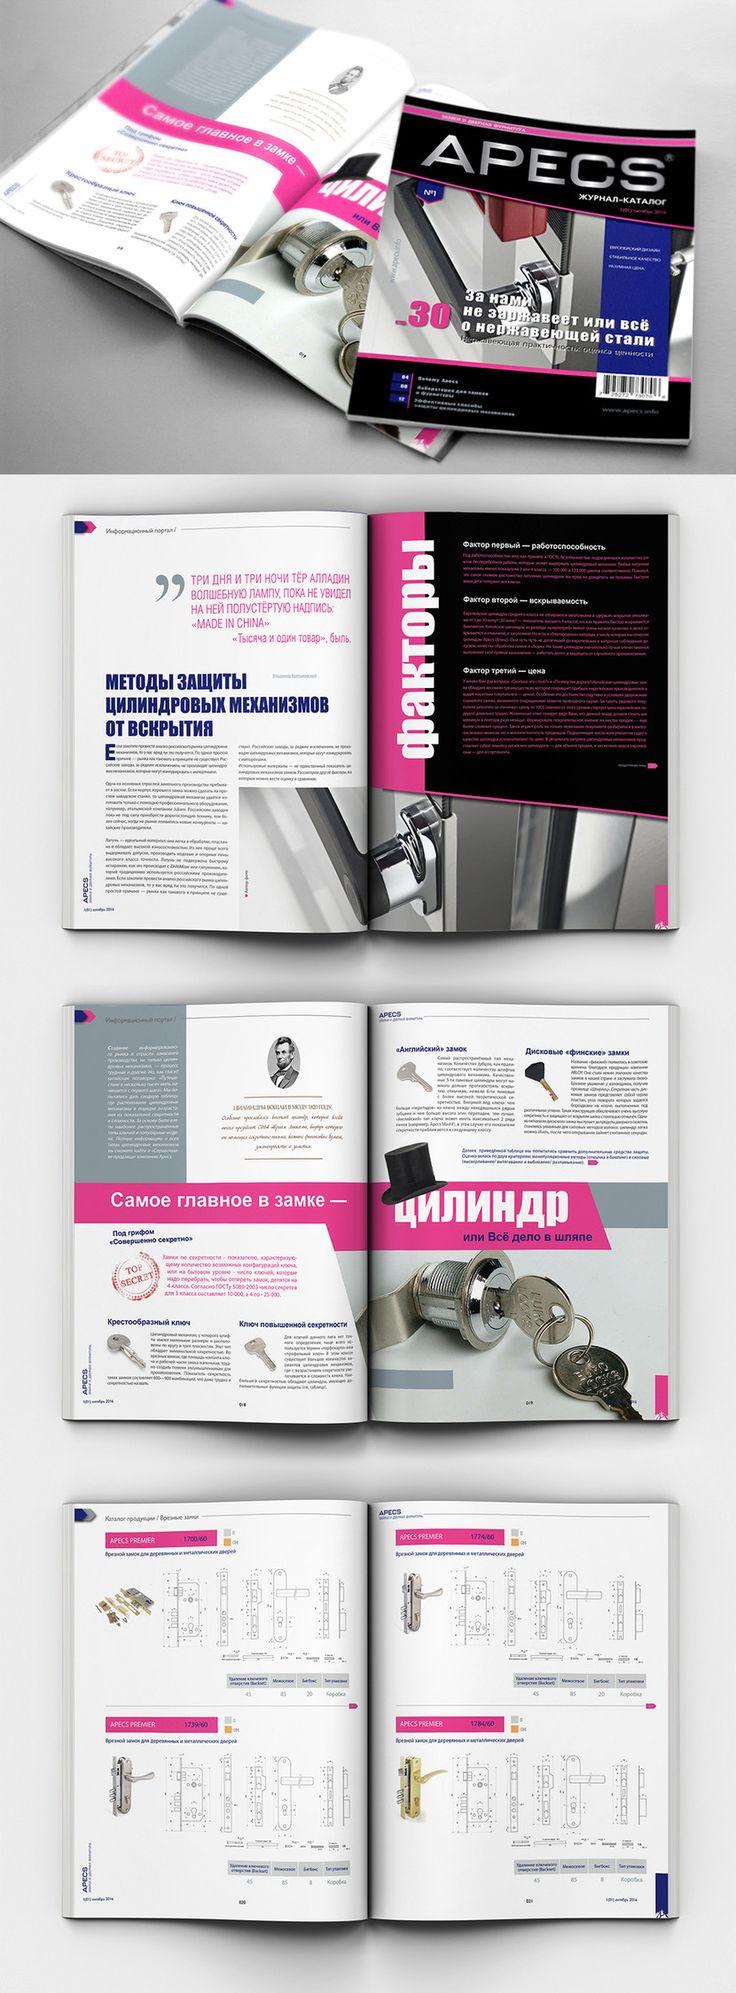 Дизайн журнала-каталога Apecs, FREELANCE.boutique